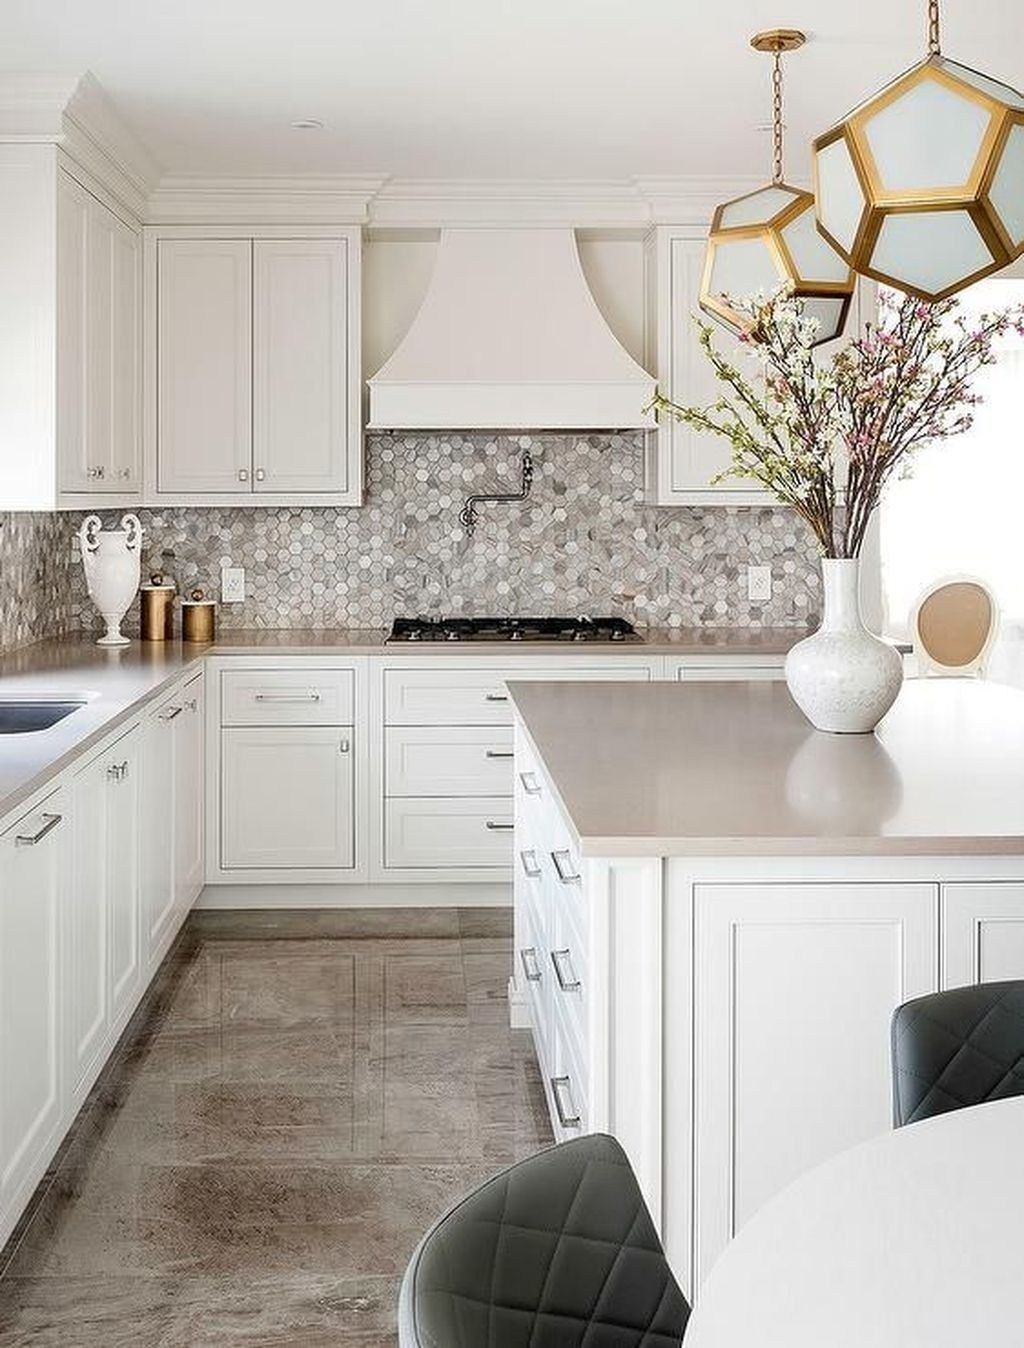 30+ Lovely White Kitchen Backsplash Design Ideas (With ...